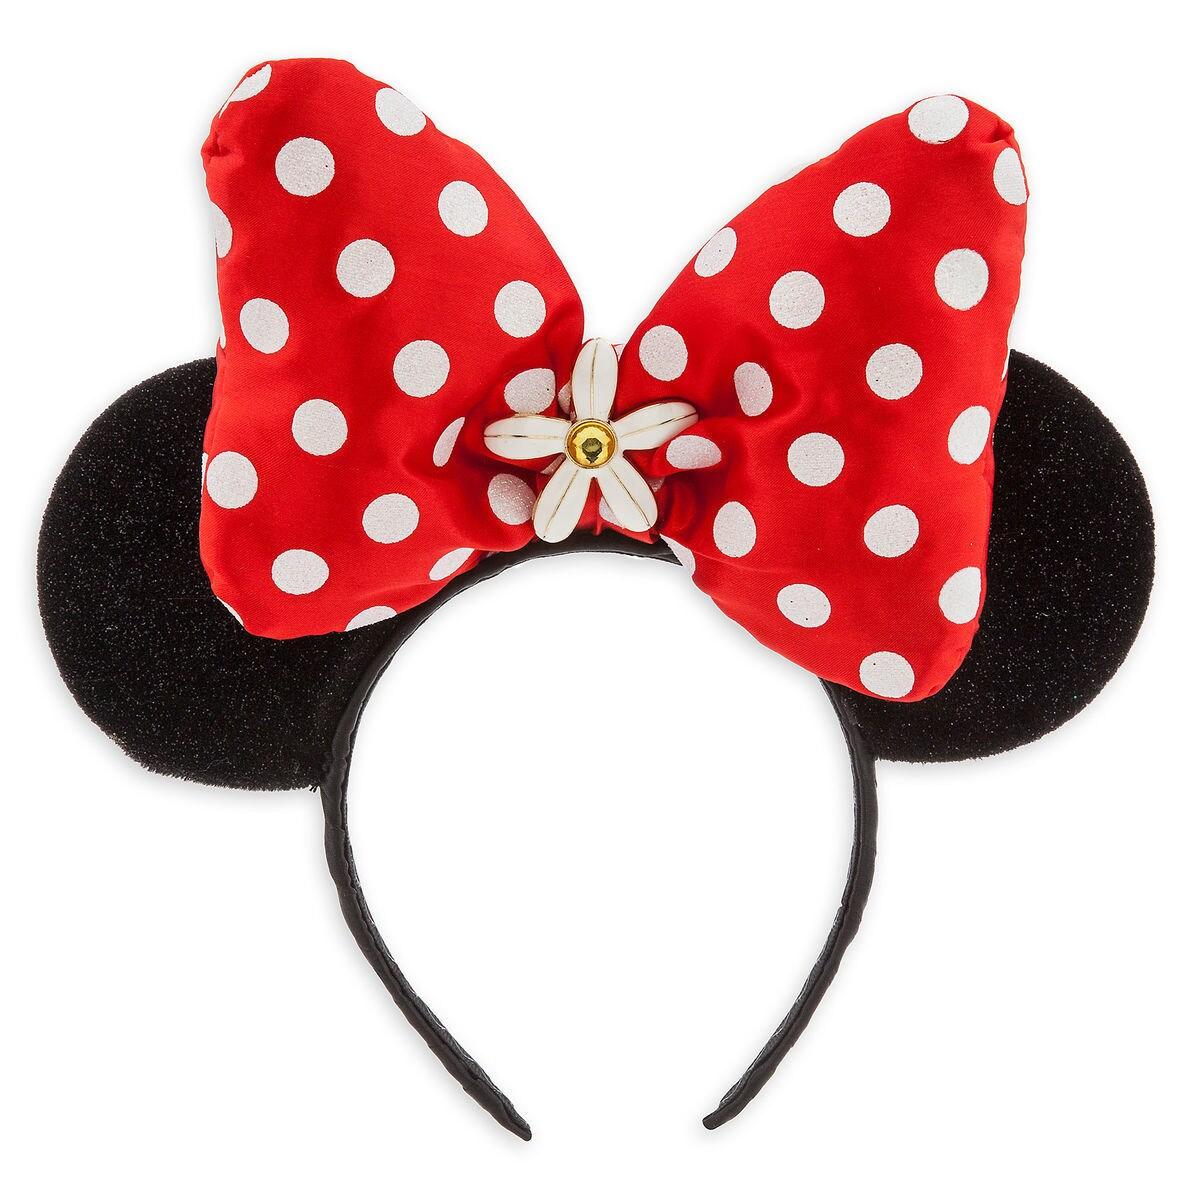 Minnie Mouse Ear Headband Red Bow Shopdisney